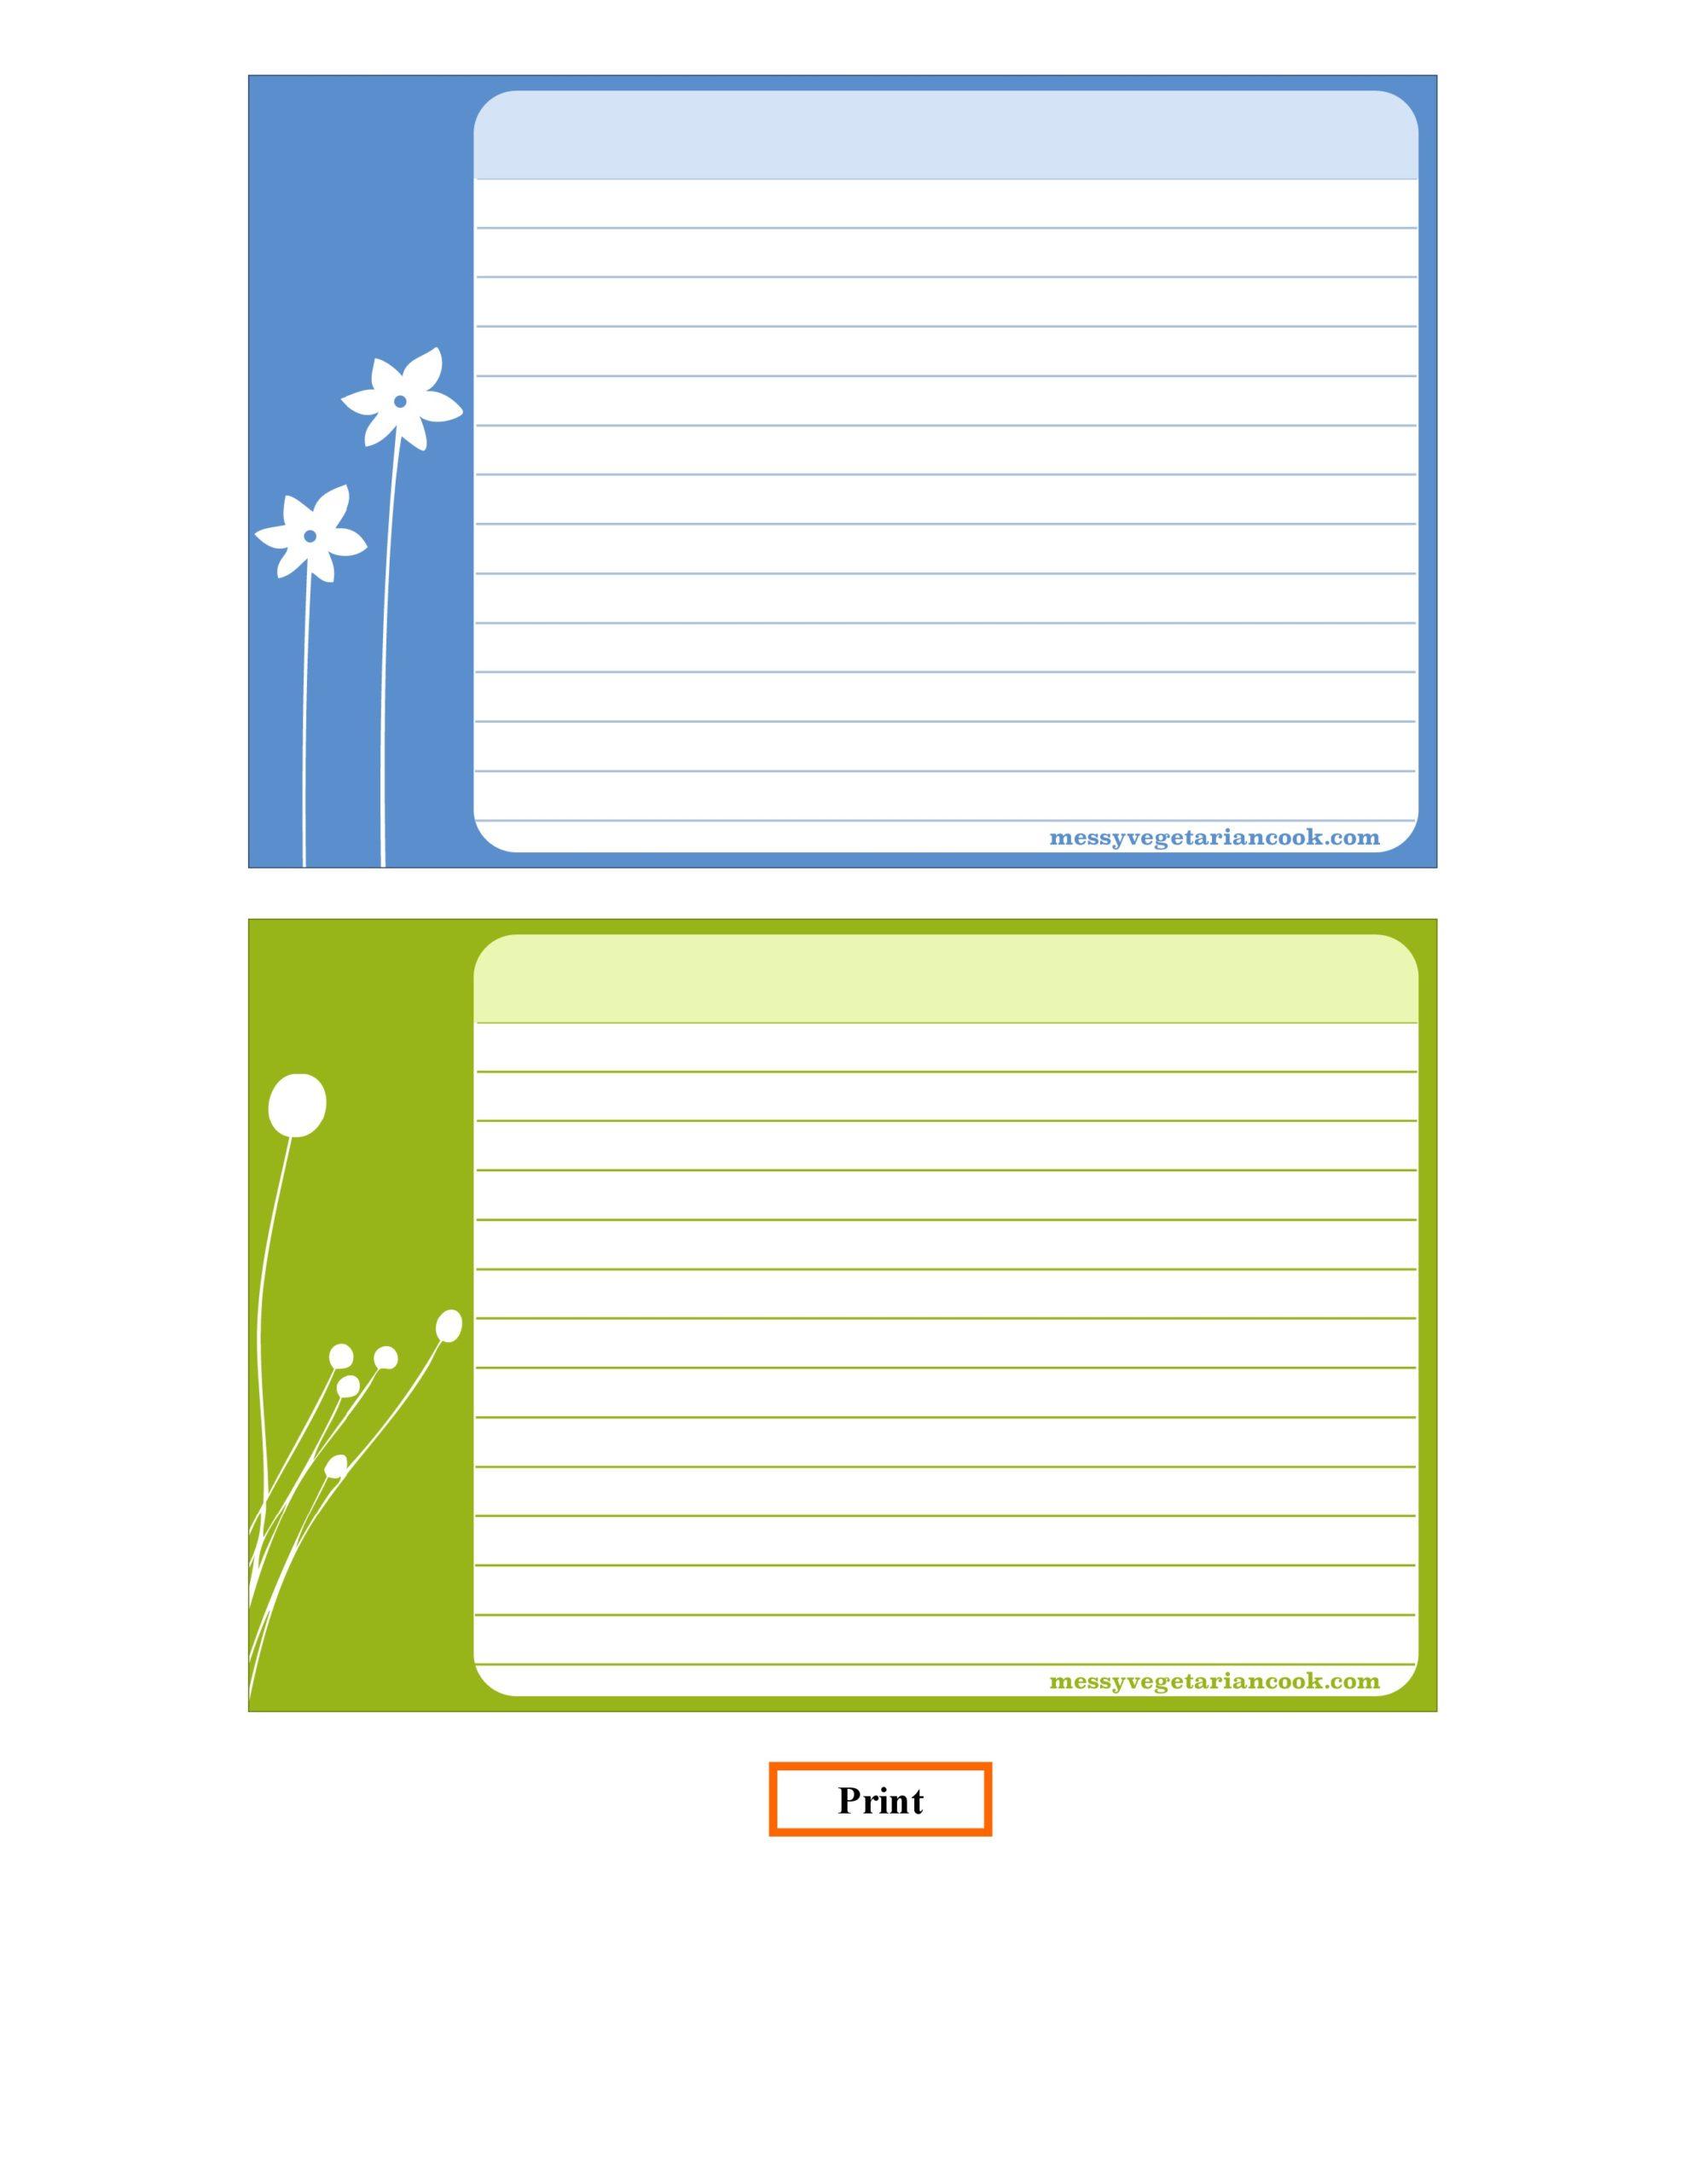 21 Free Recipe Card Templates (Word, Google Docs) - TemplateArchive In Google Docs Note Card Template